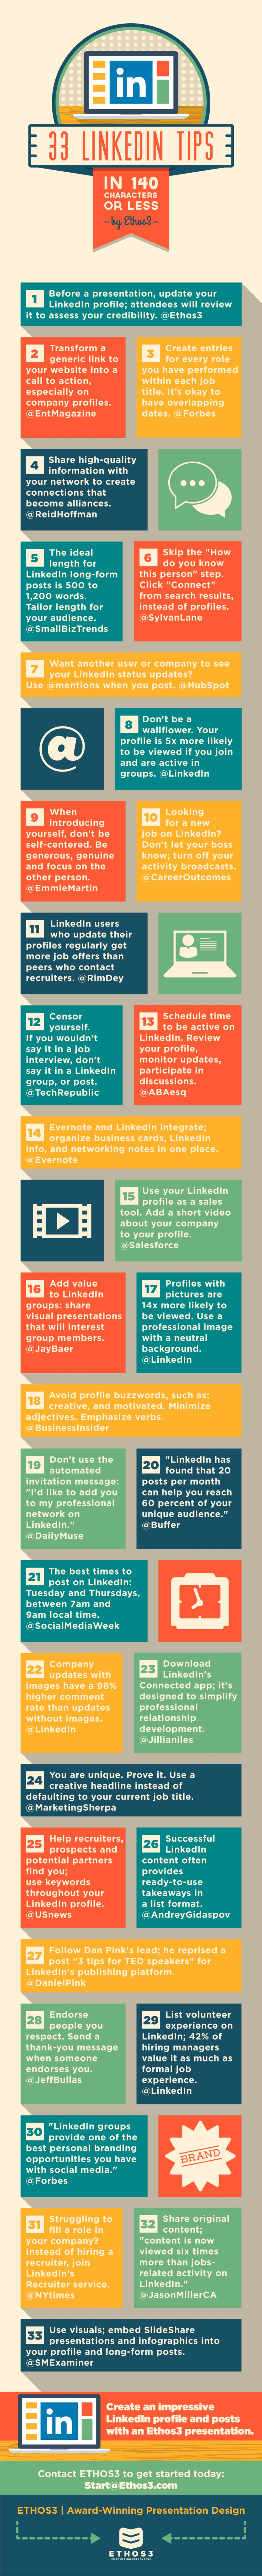 33-linkedin-tips-infographic